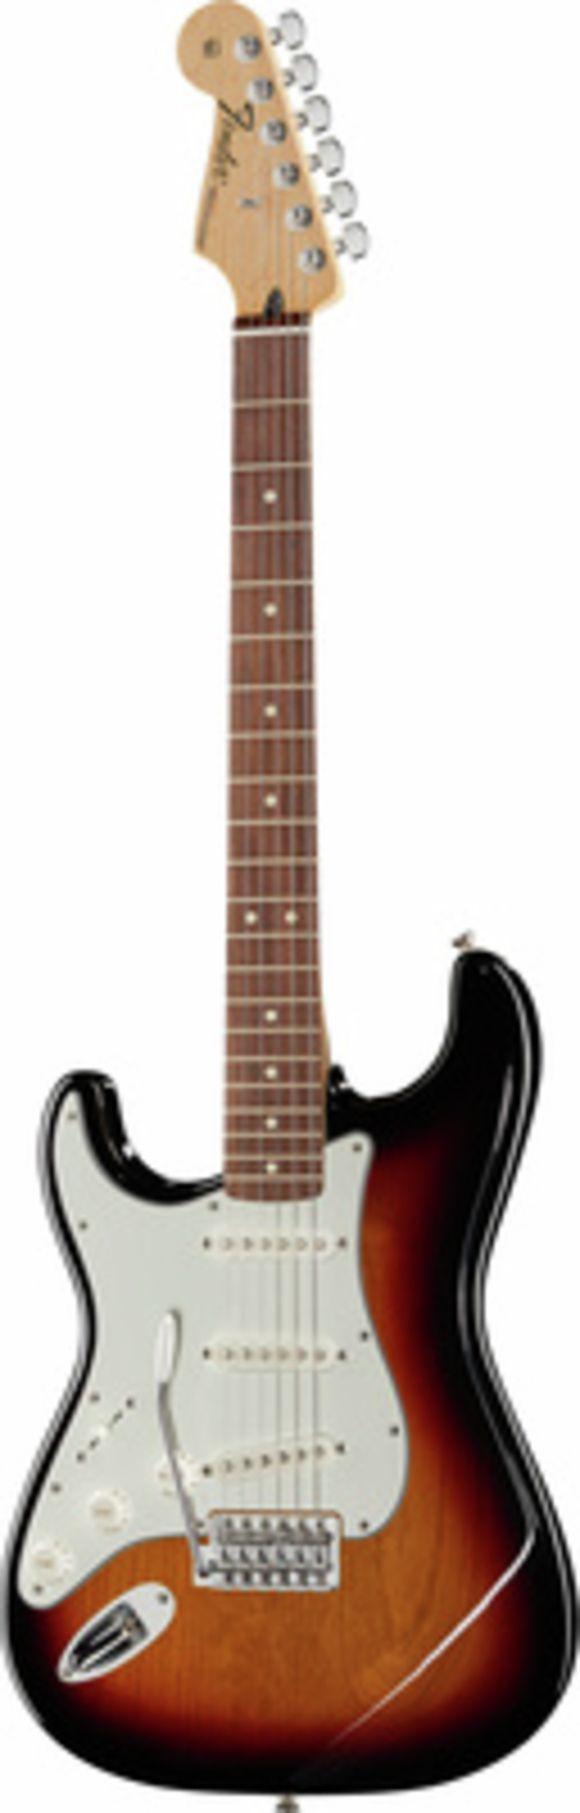 Standard Strat PF BSB LH Fender